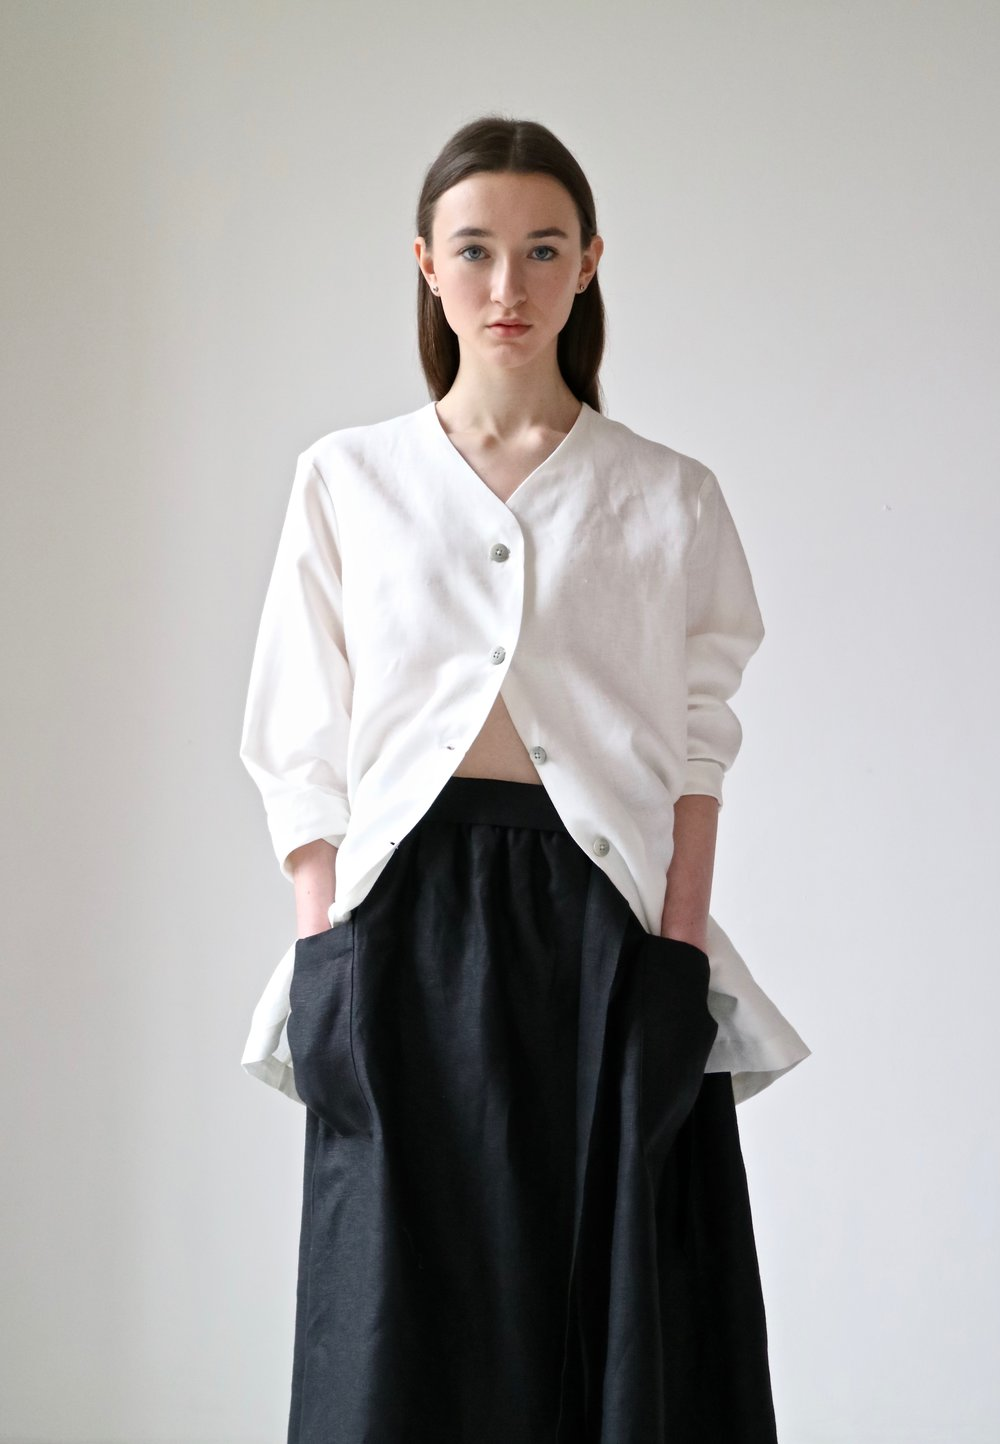 White apron ireland - Irish Linen Clothing Womenswear Menswear And Home Goods 31 Chapel Lane